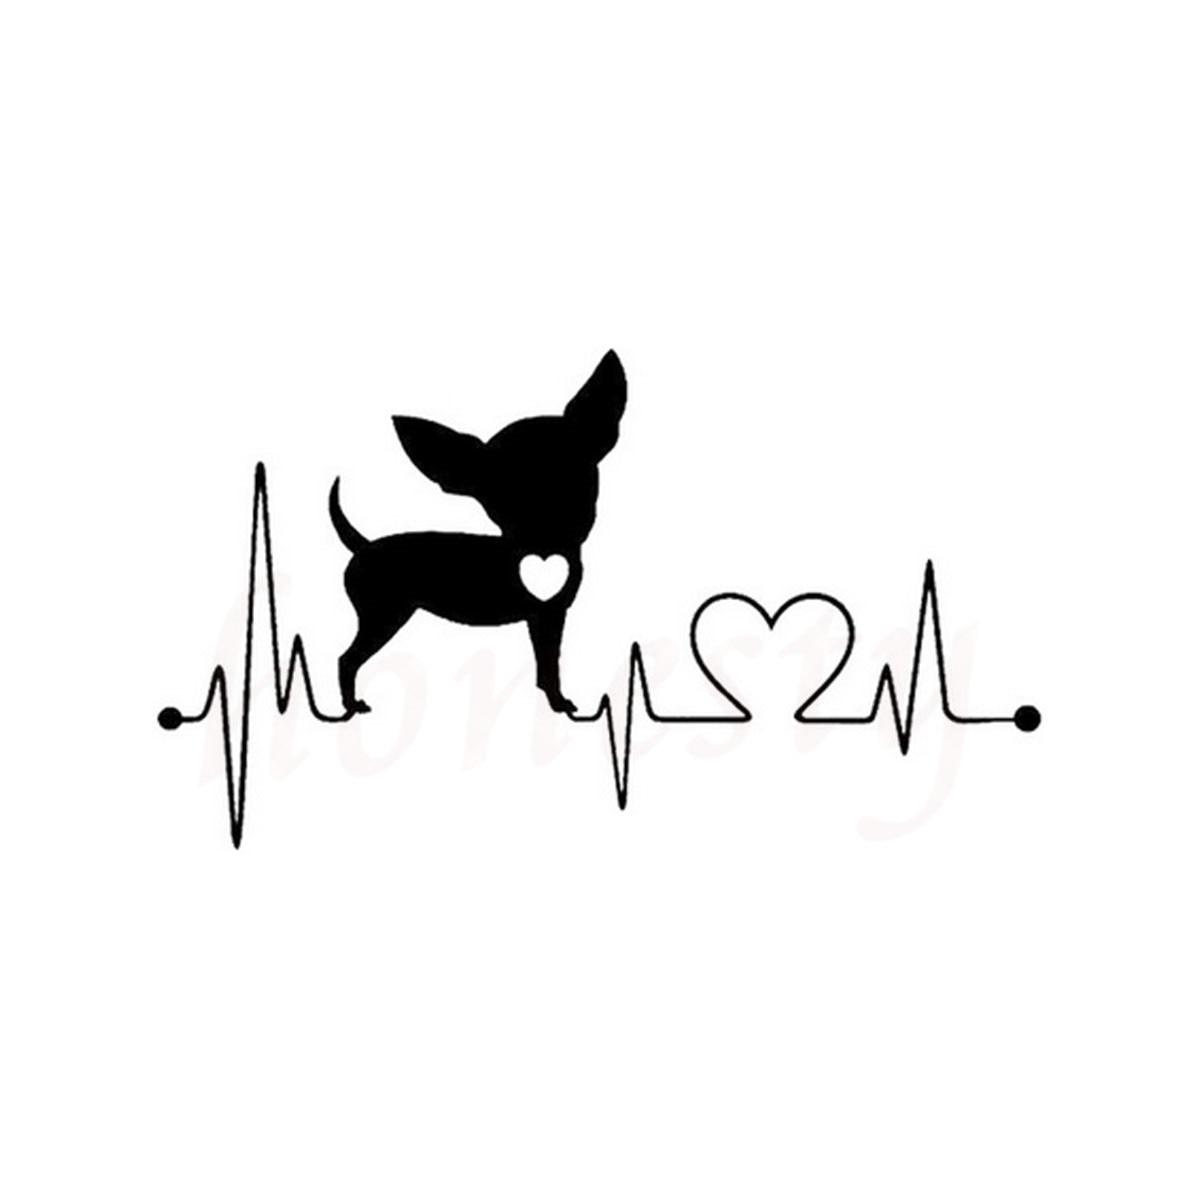 Chihuahua Heartbeat Dog Funny Animal Car Stickers Wall